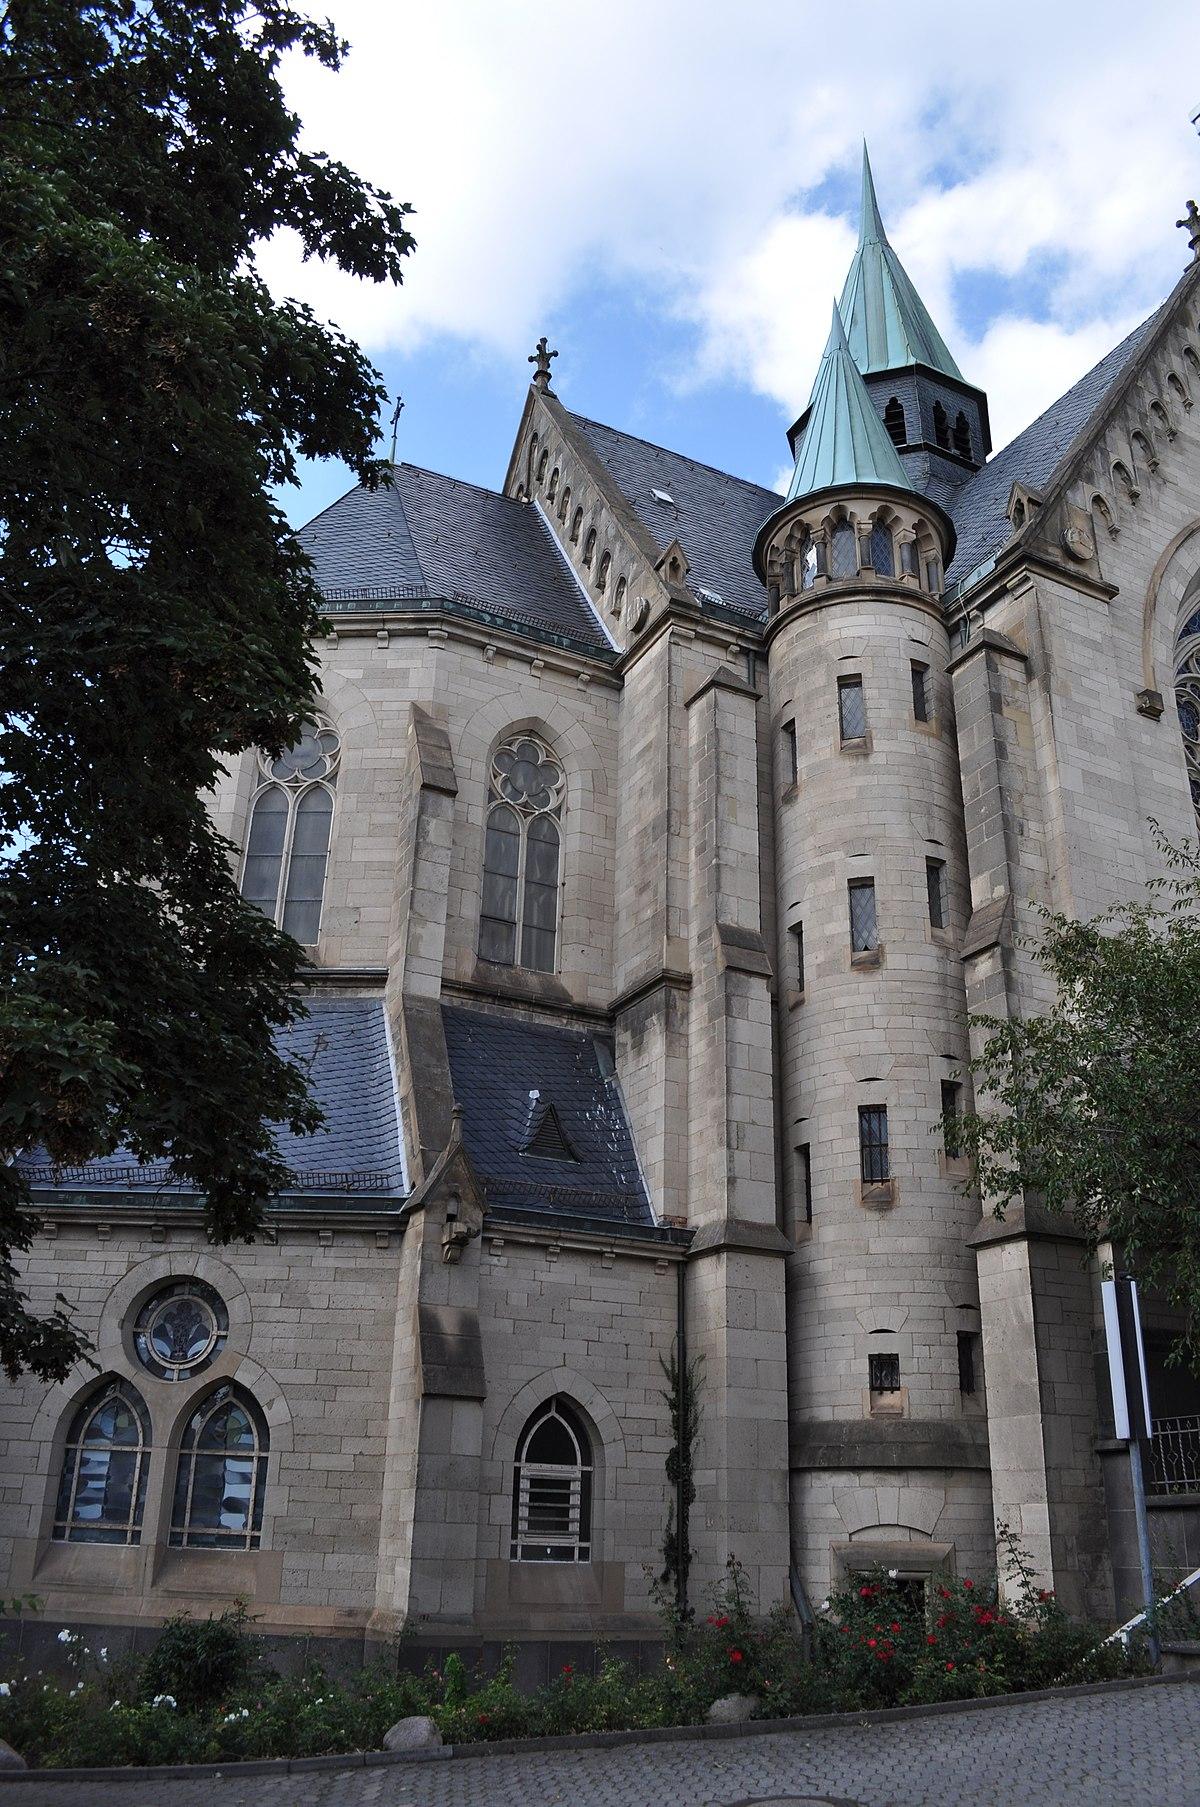 marienkirche bad homburg wikipedia. Black Bedroom Furniture Sets. Home Design Ideas